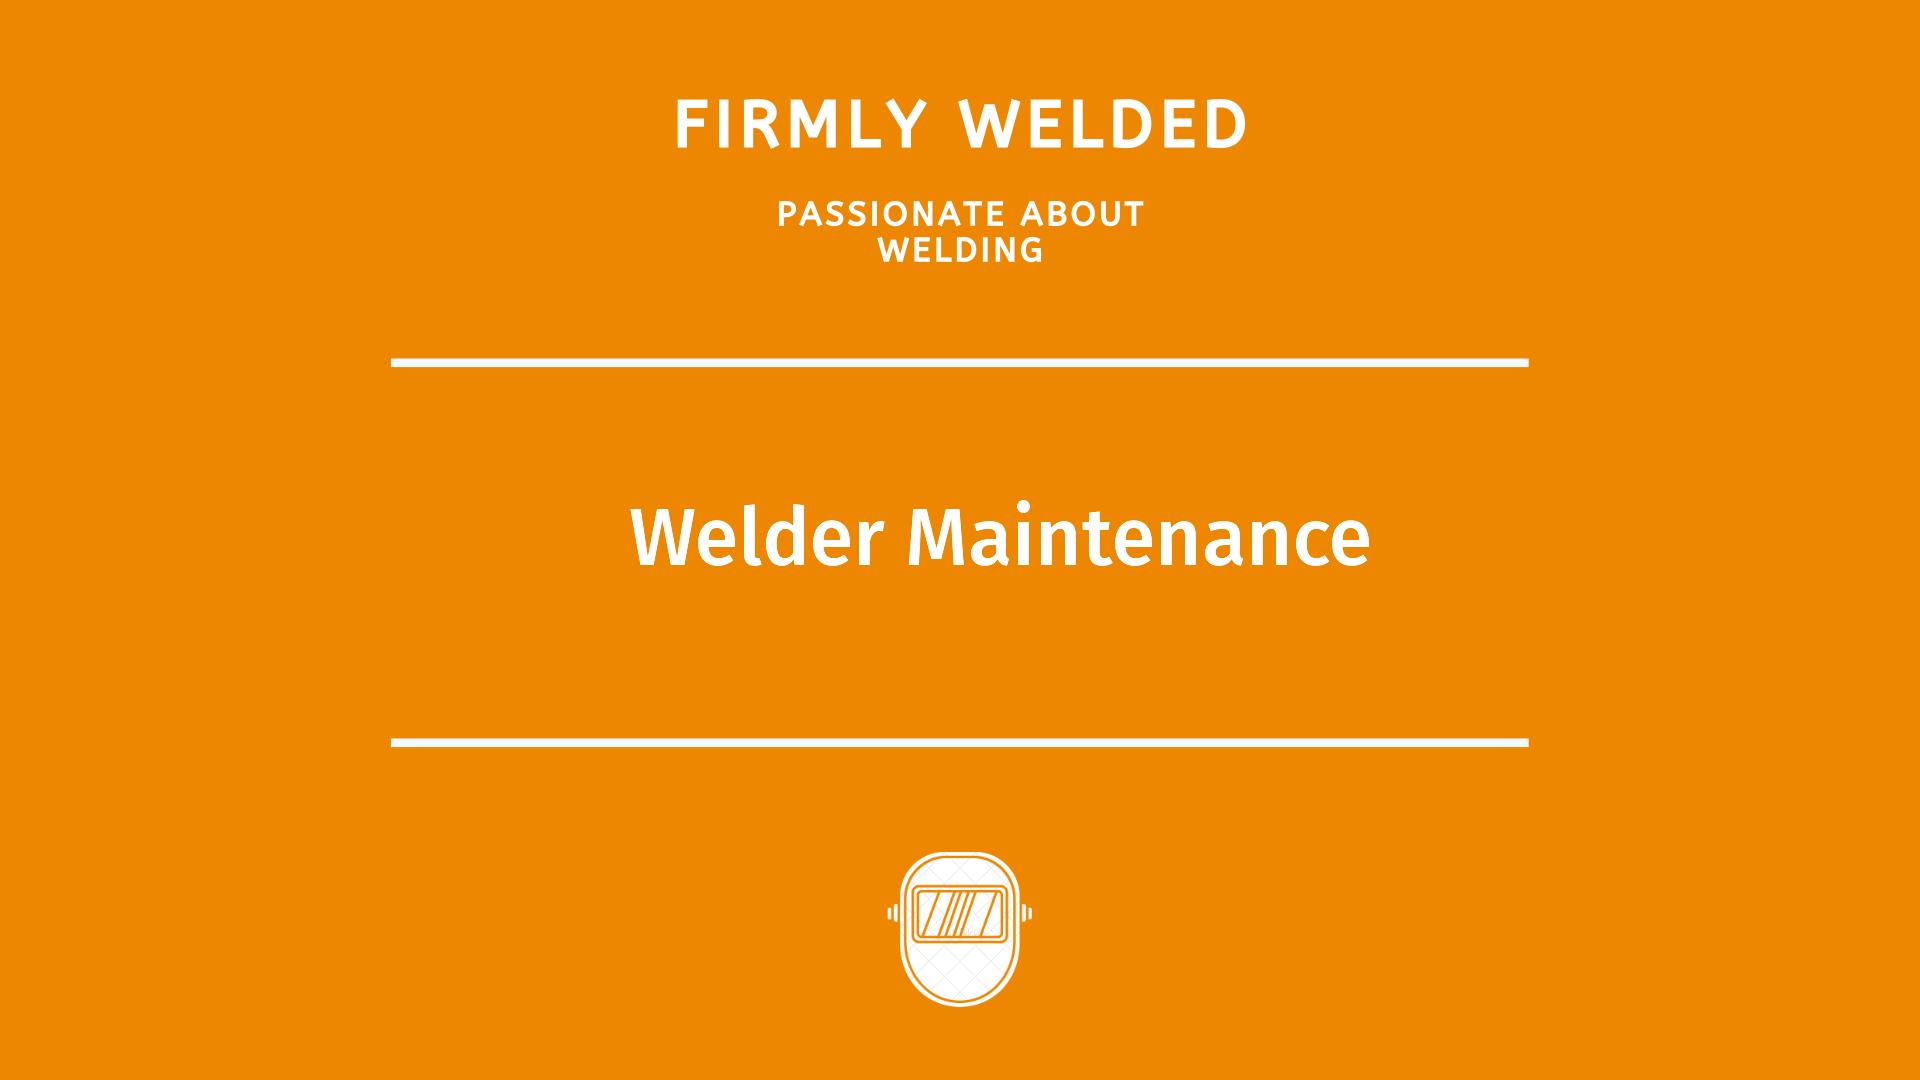 Welder Maintenance